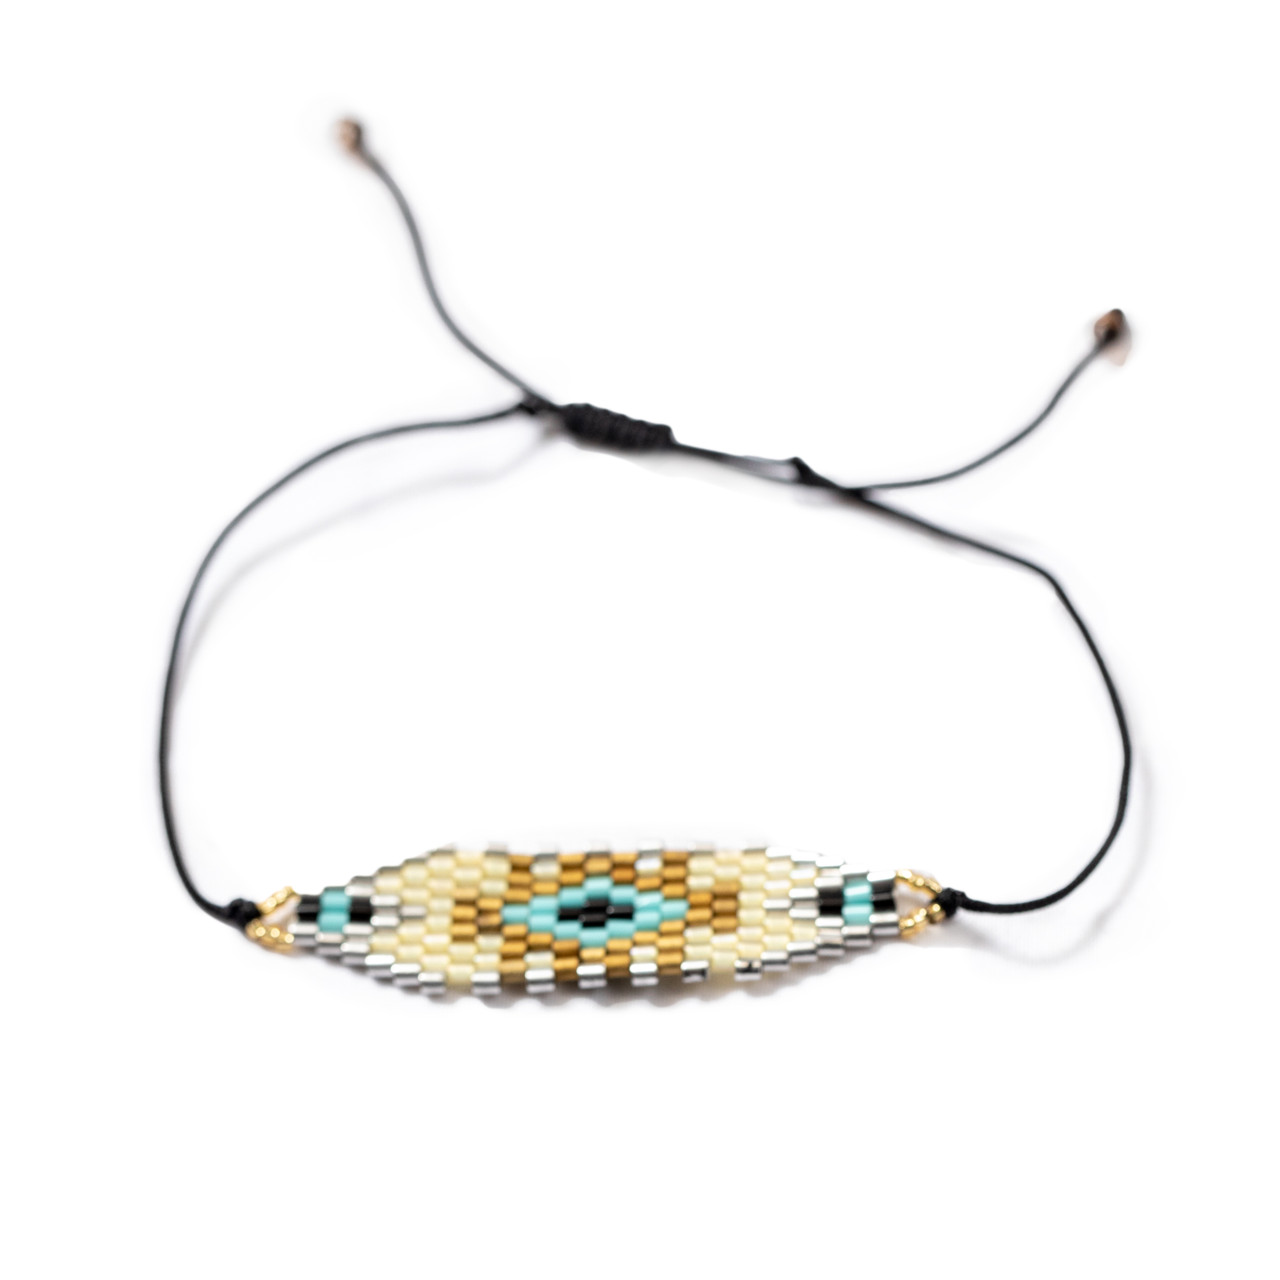 Silver & Gold Patterned Beaded Bracelet